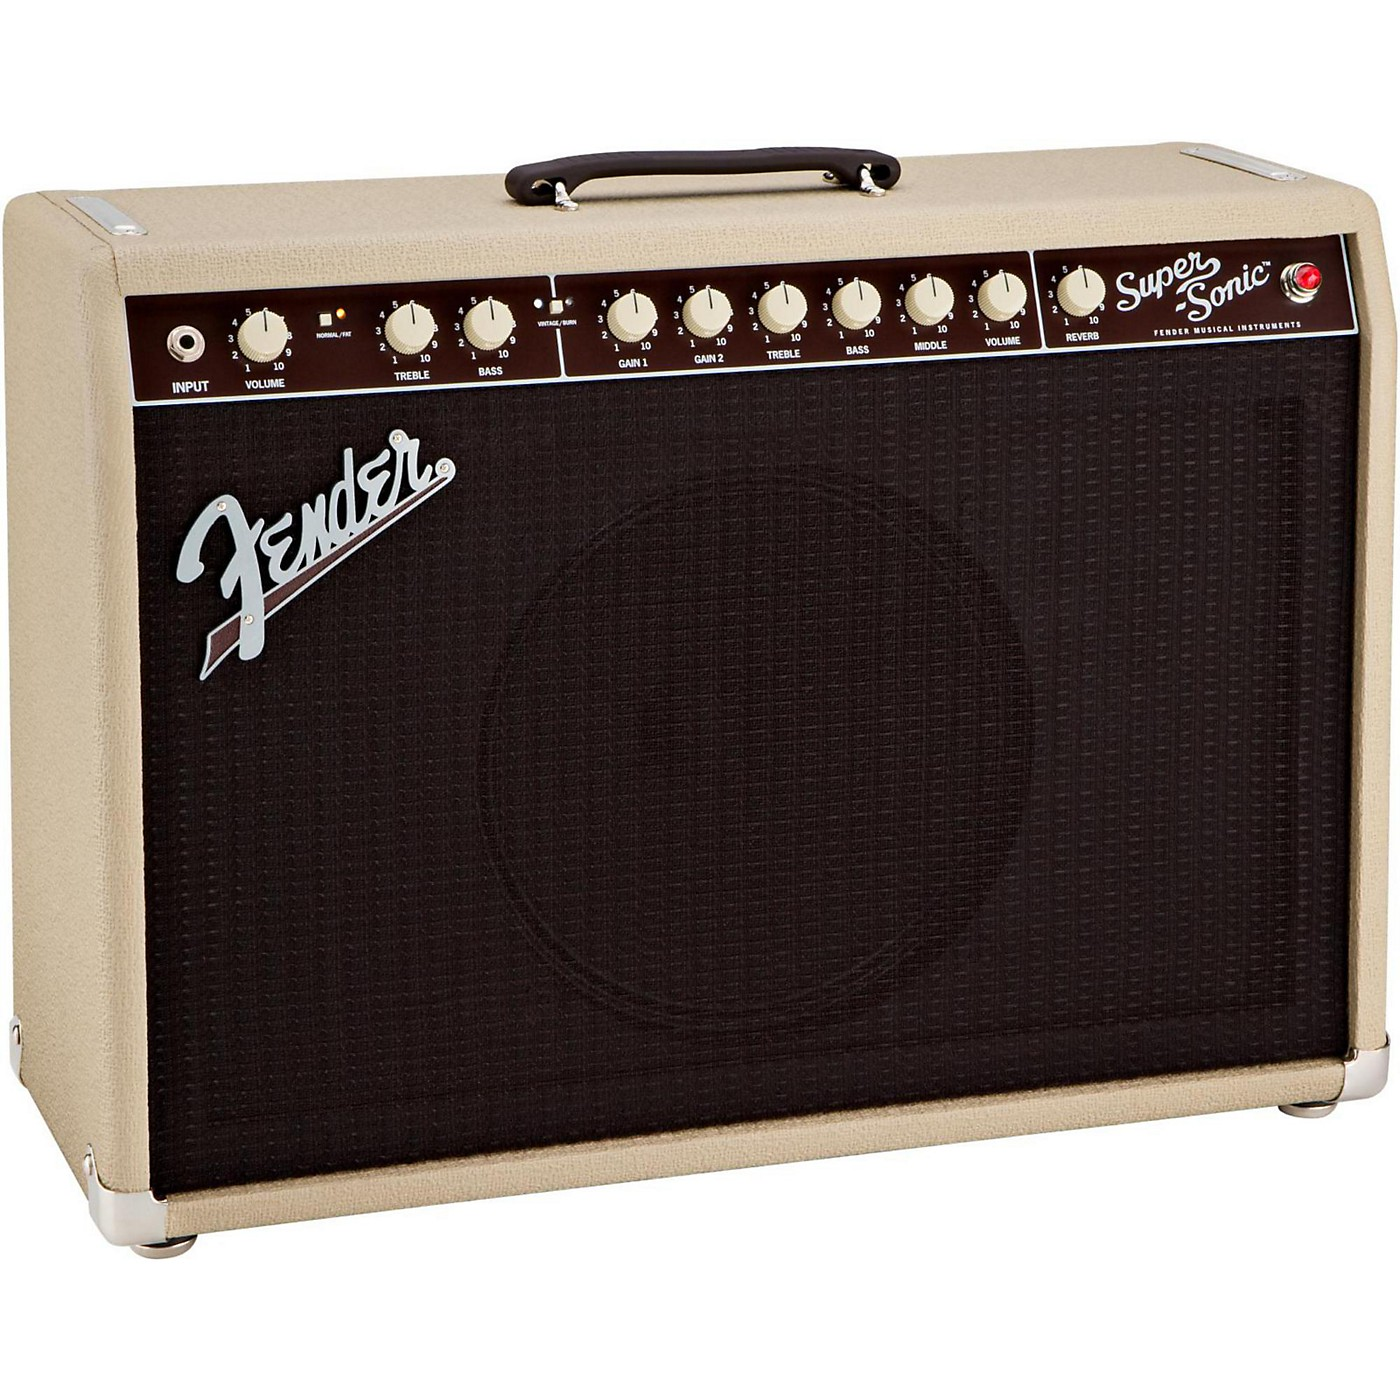 Fender Super-Sonic 22 22W 1x12 Tube Guitar Combo Amp thumbnail